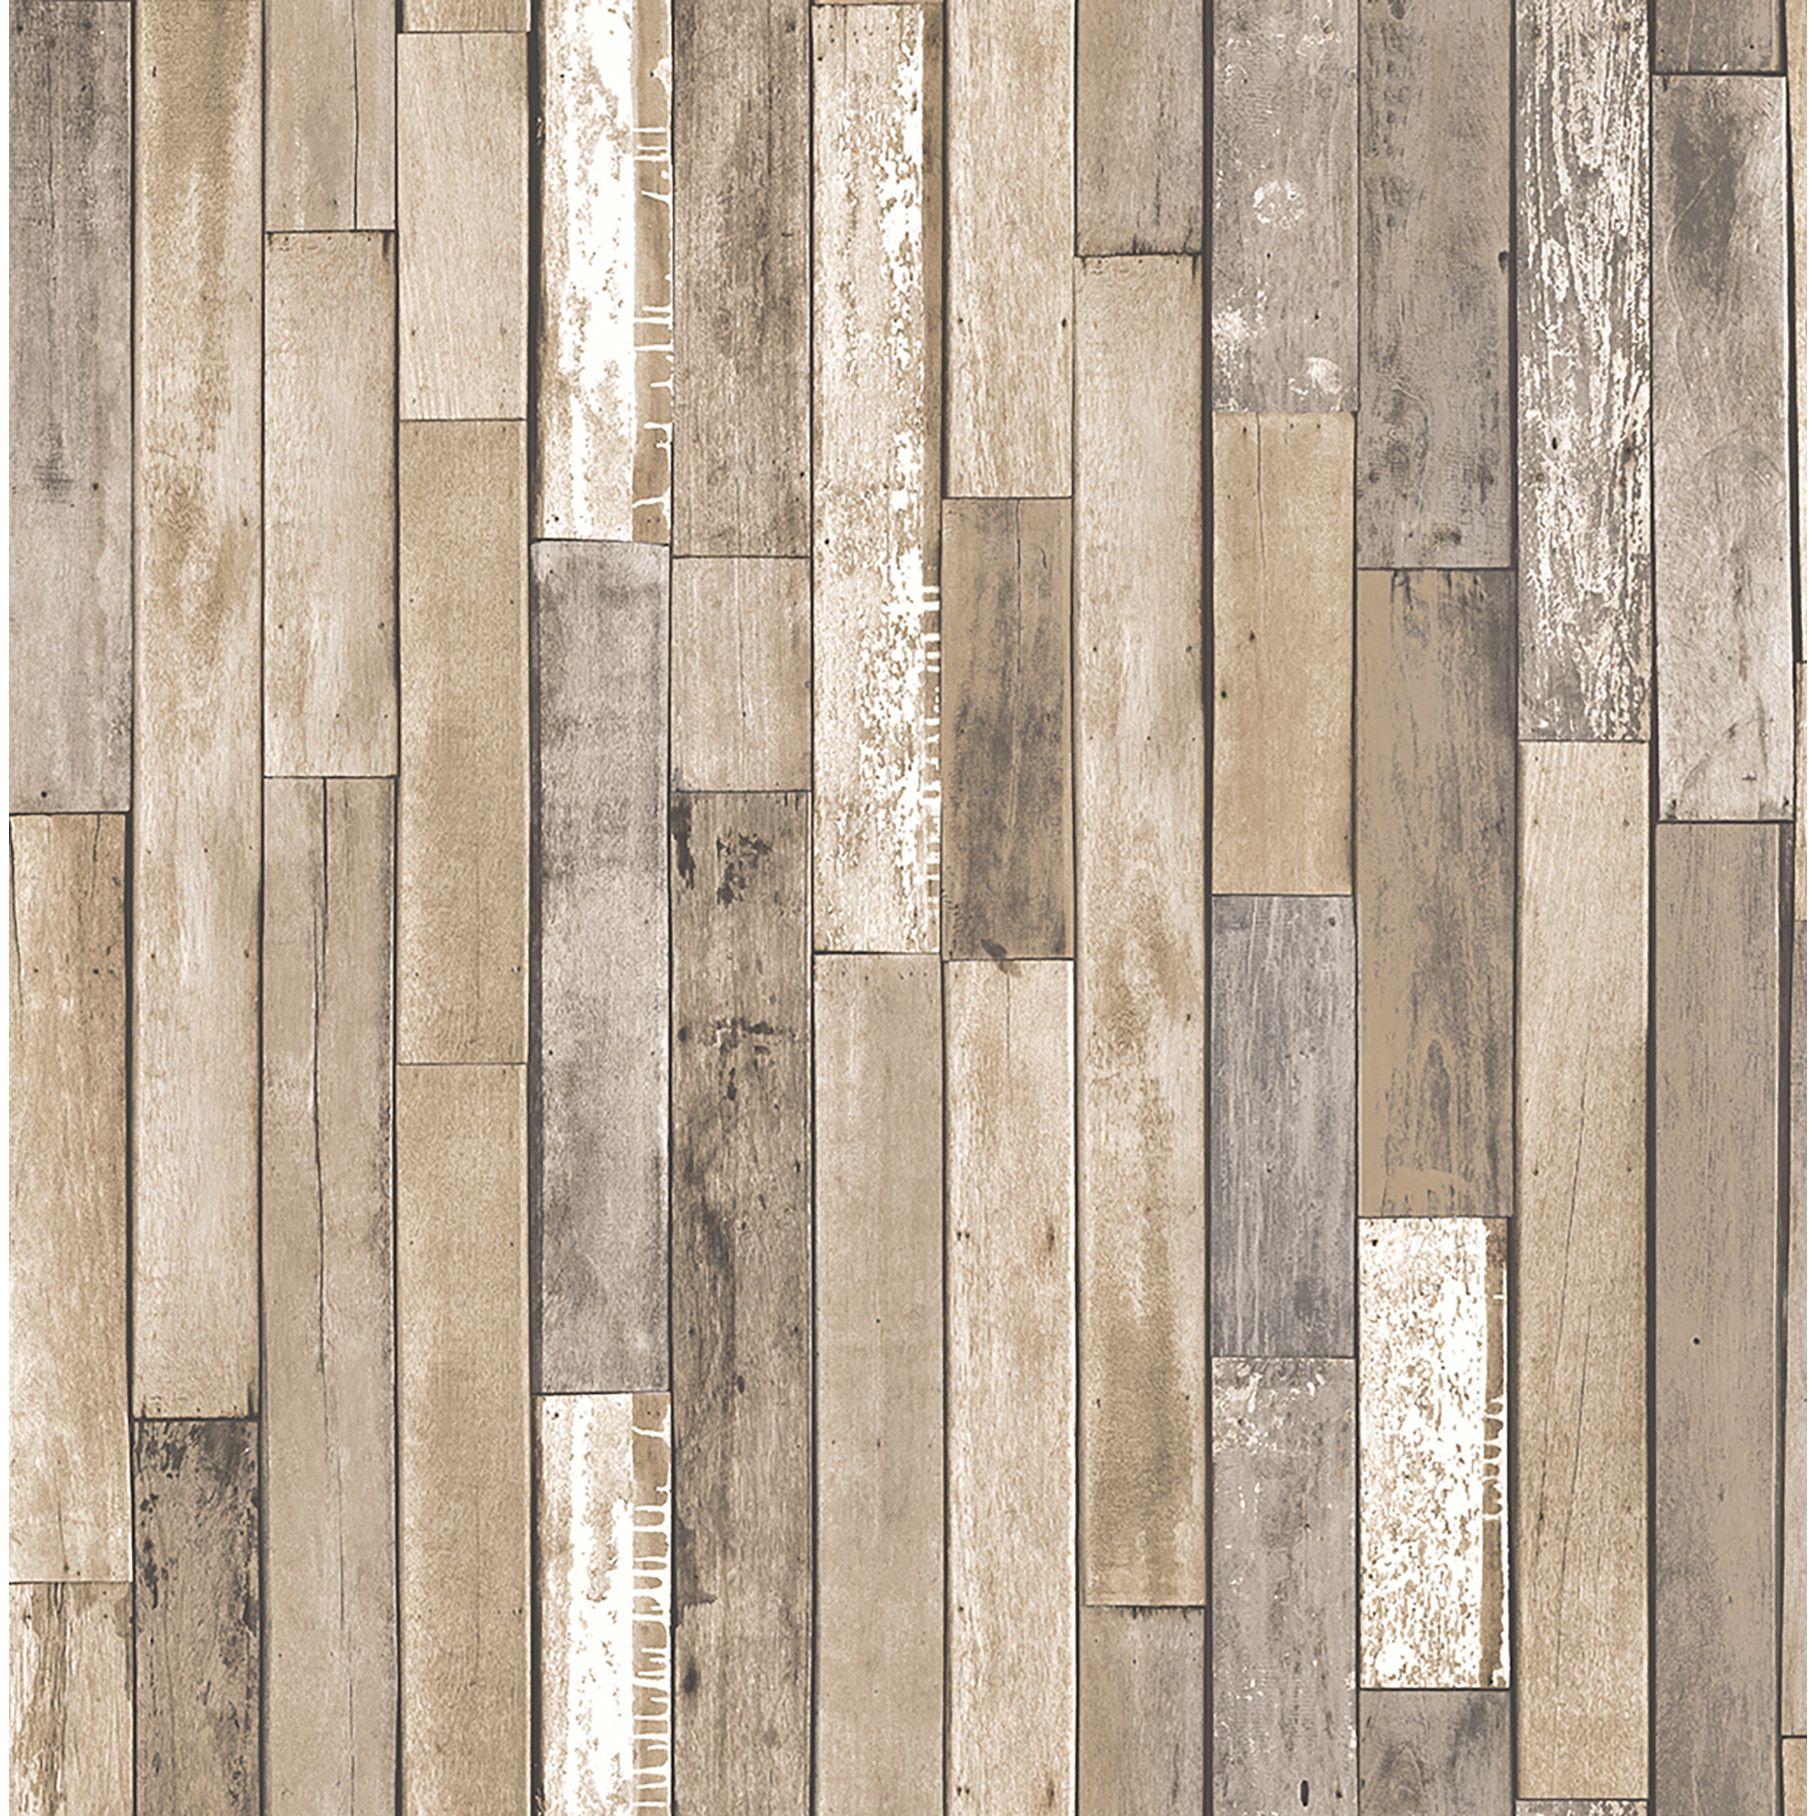 Brewster Home Fashions Essentials Barn Board Thin Plank 33 X 20 5 Wood Wallpaper Rustic Wood Wallpaper Wood Wallpaper Faux Wood Wall